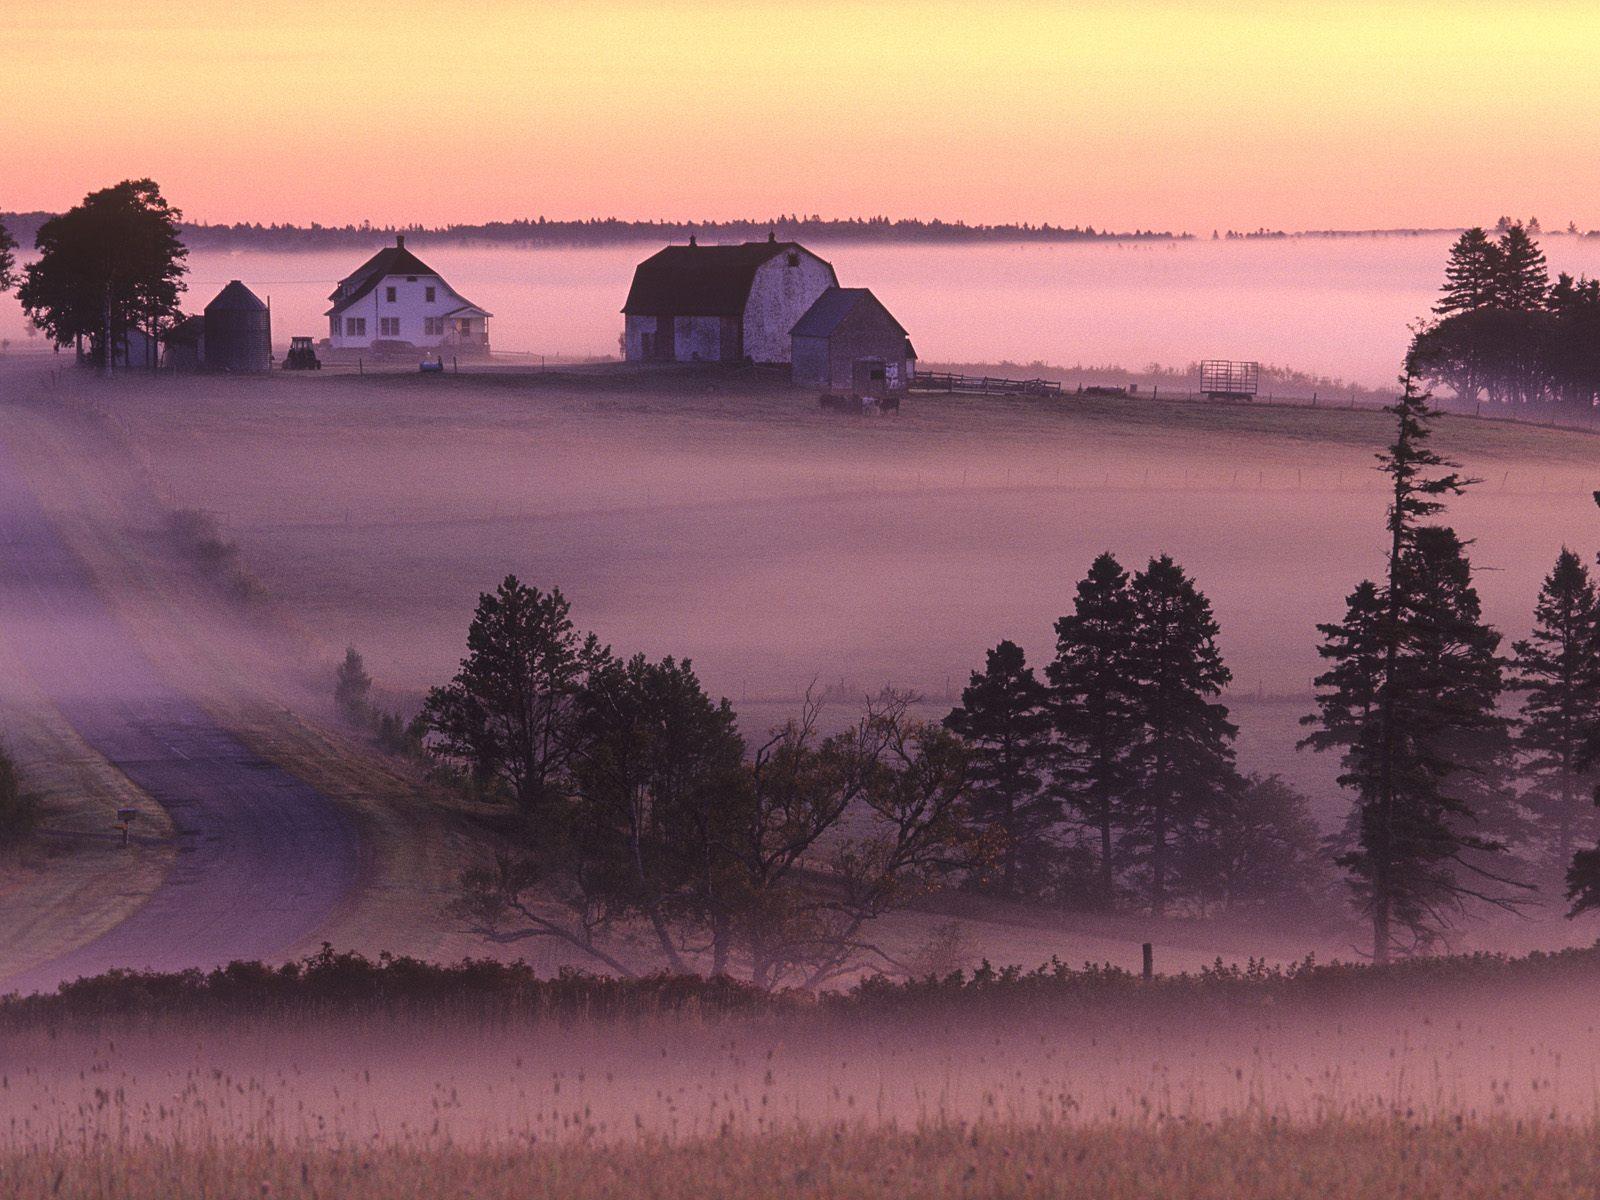 Wallpaper canada fog morning Clyde River Prince Edward Island 1600x1200